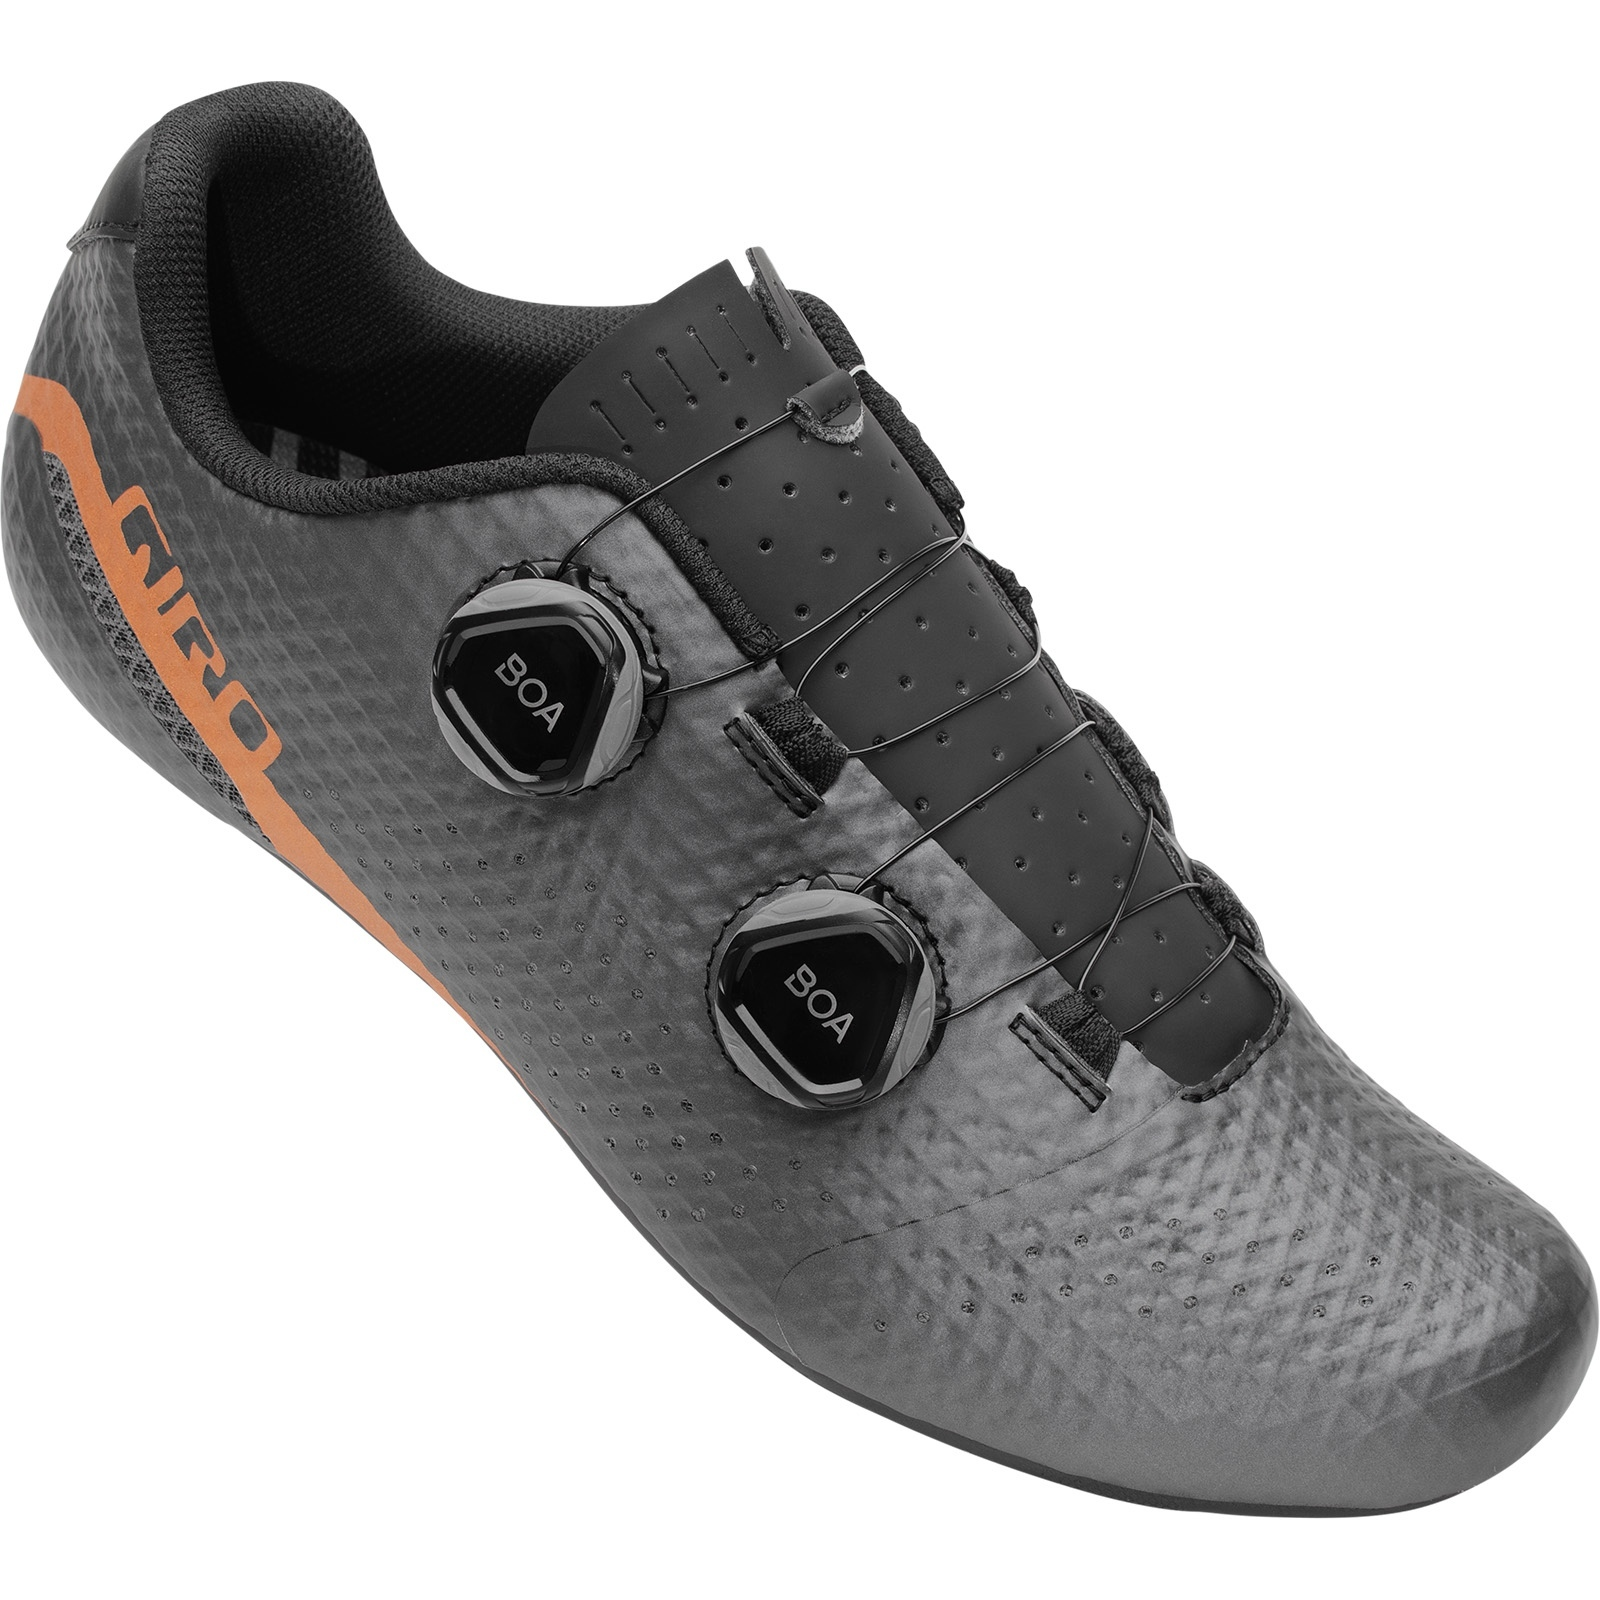 Giro Regime Rennradschuh - black/copper